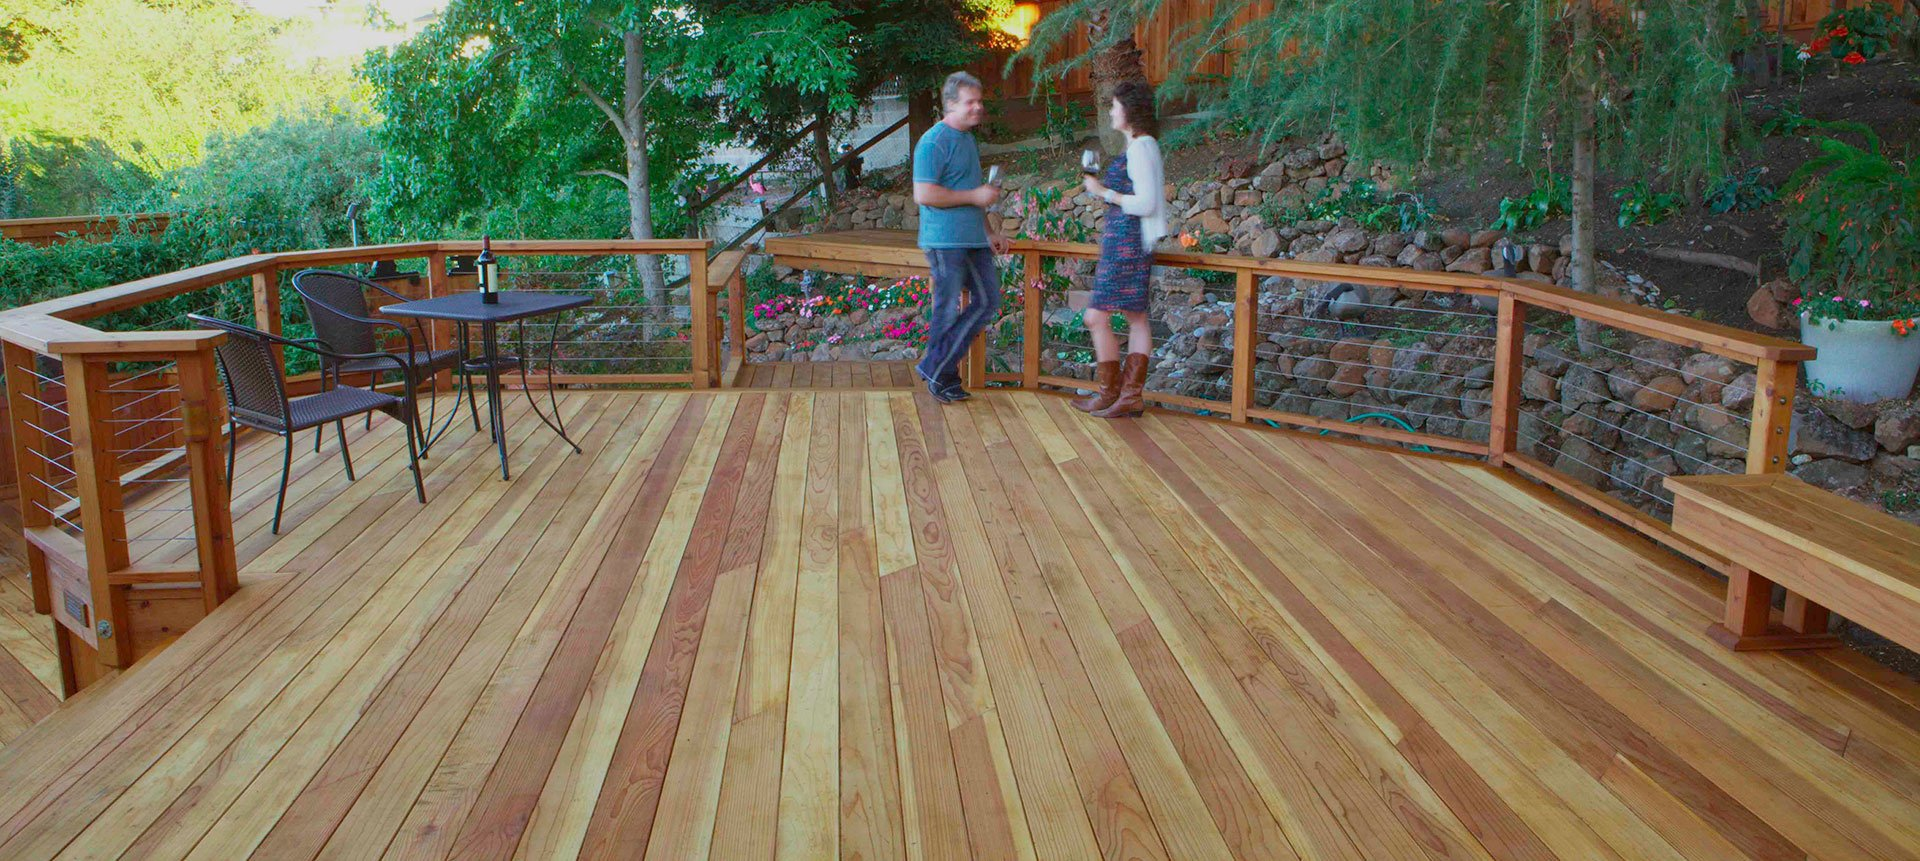 Decking Humboldt Redwood